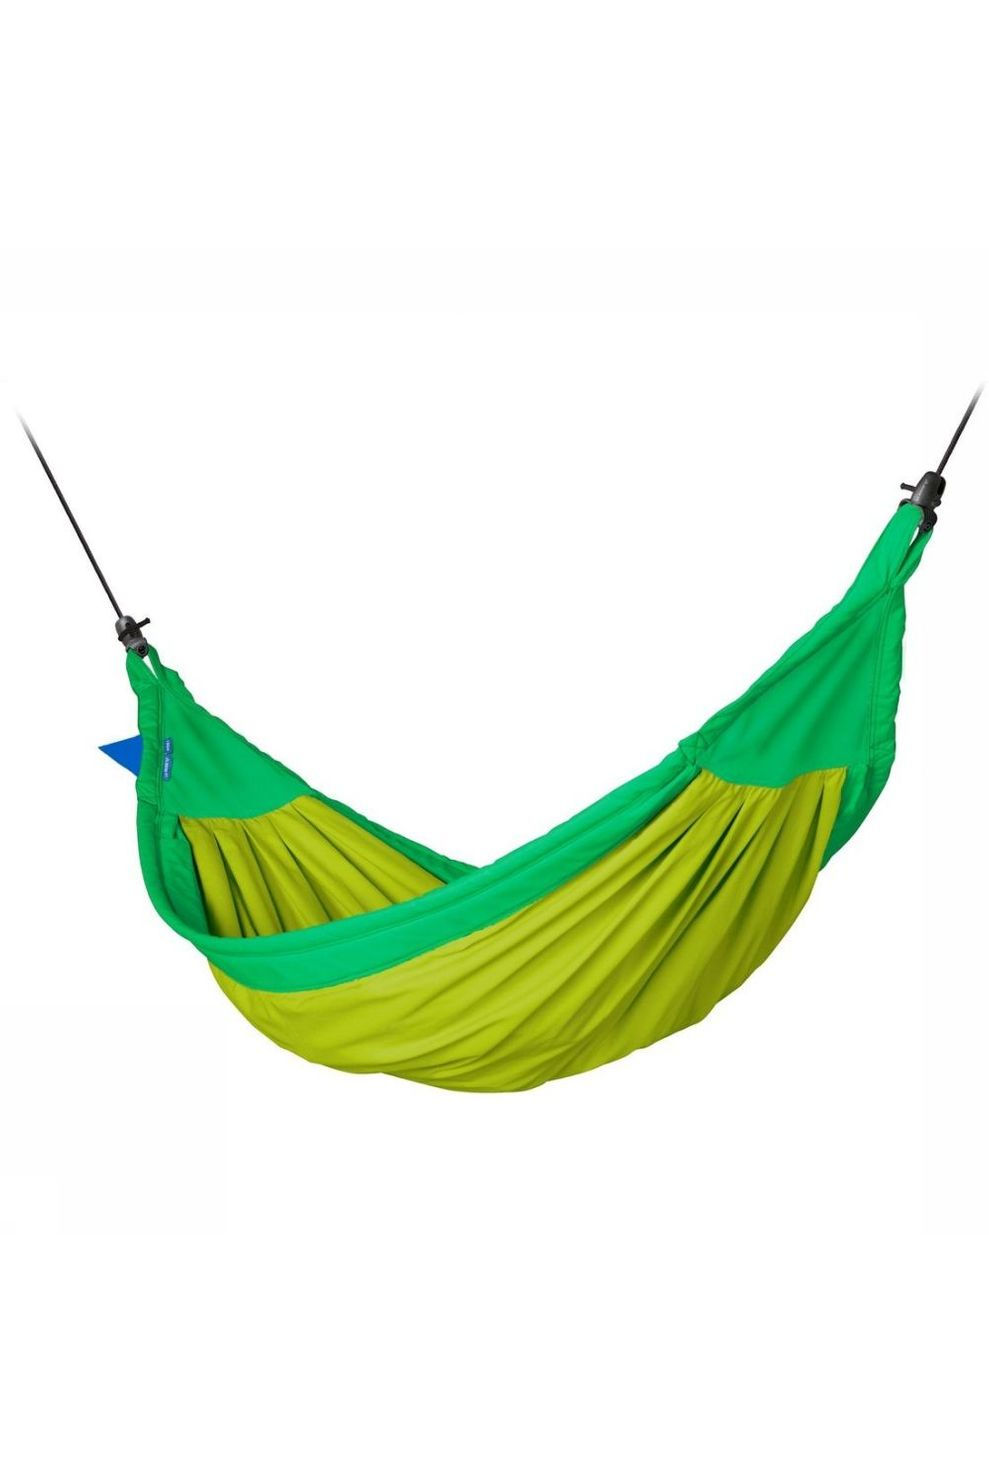 La Siesta Hangmat Moki - Limoen Groen